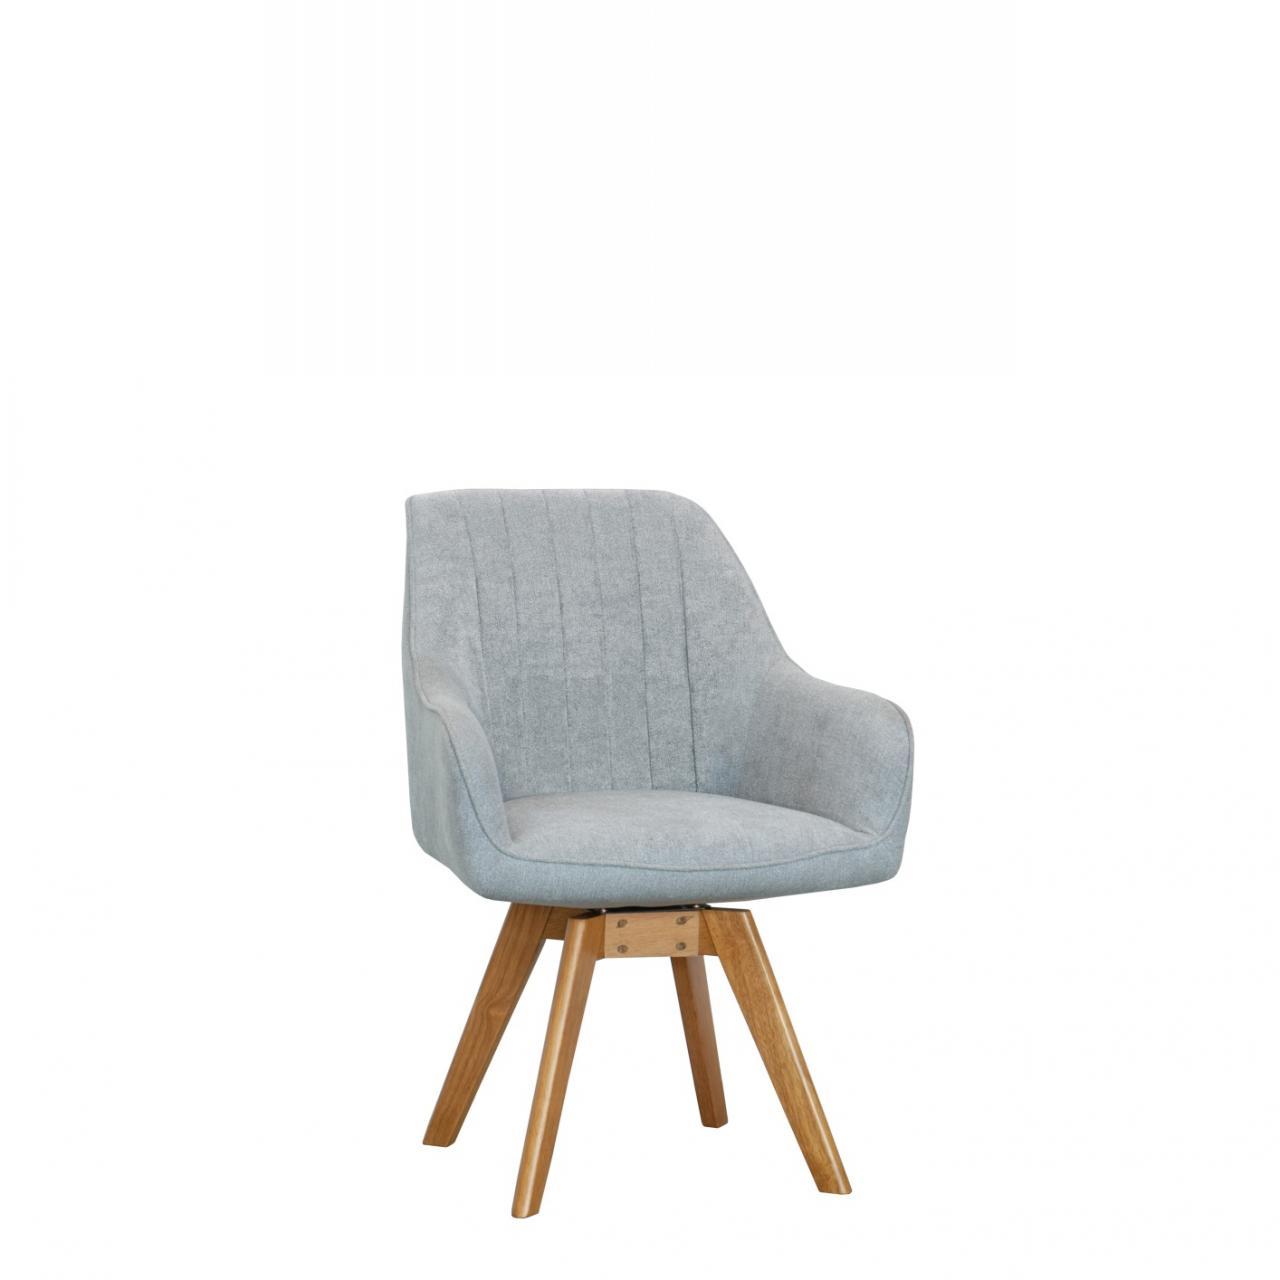 Stuhl ST-0160 Hellgrau Natur Massivholz Eiche Stoff Esszimmerstuhl Küche